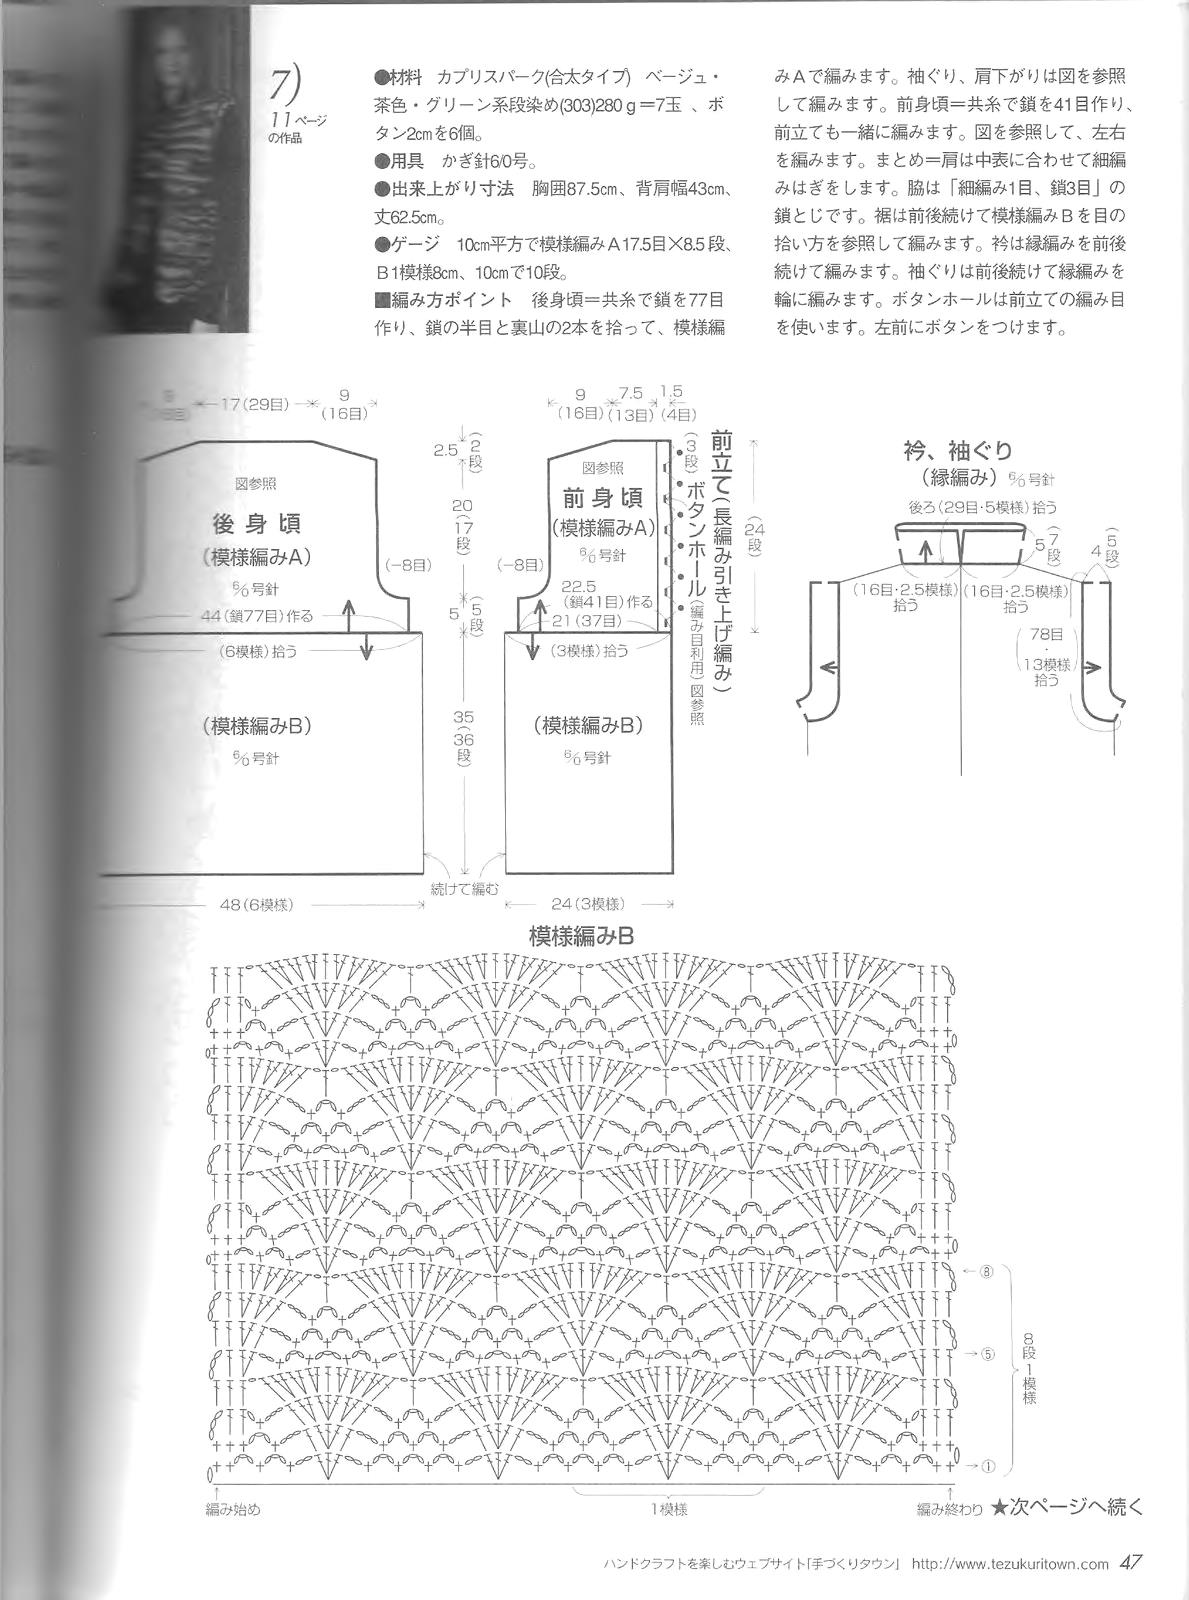 Let's knit series NV4375 2008 M-L sp-kr_47